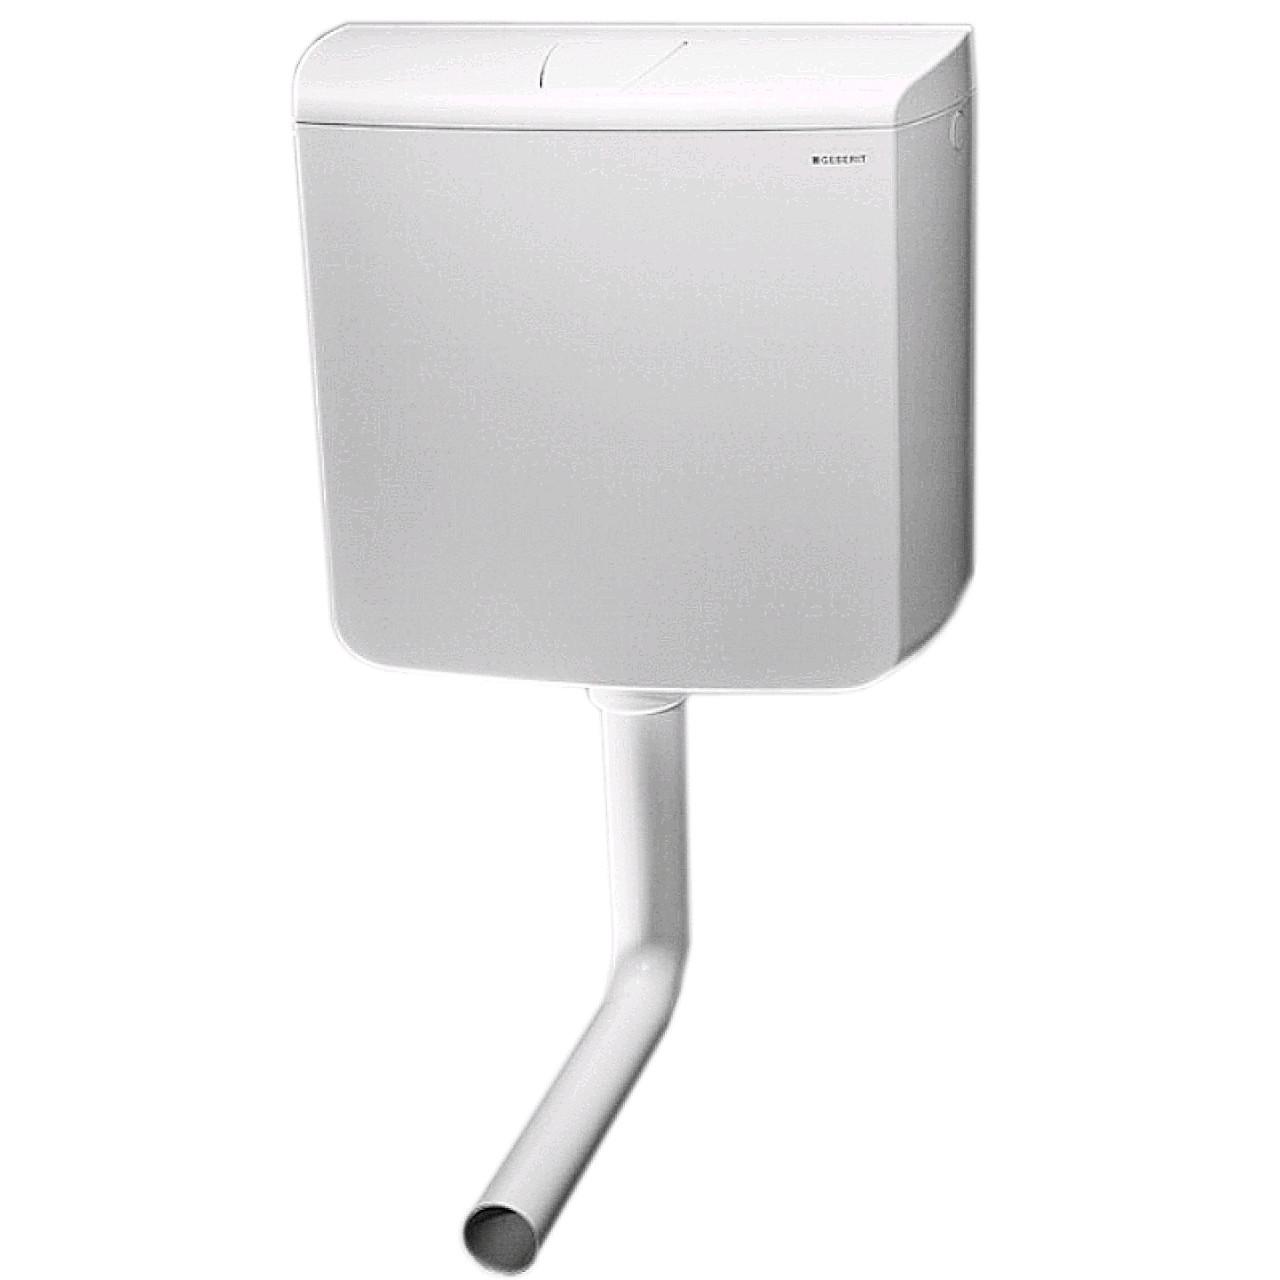 Бачок наружный AP110, stop-and-go flush, для низкого монтажа